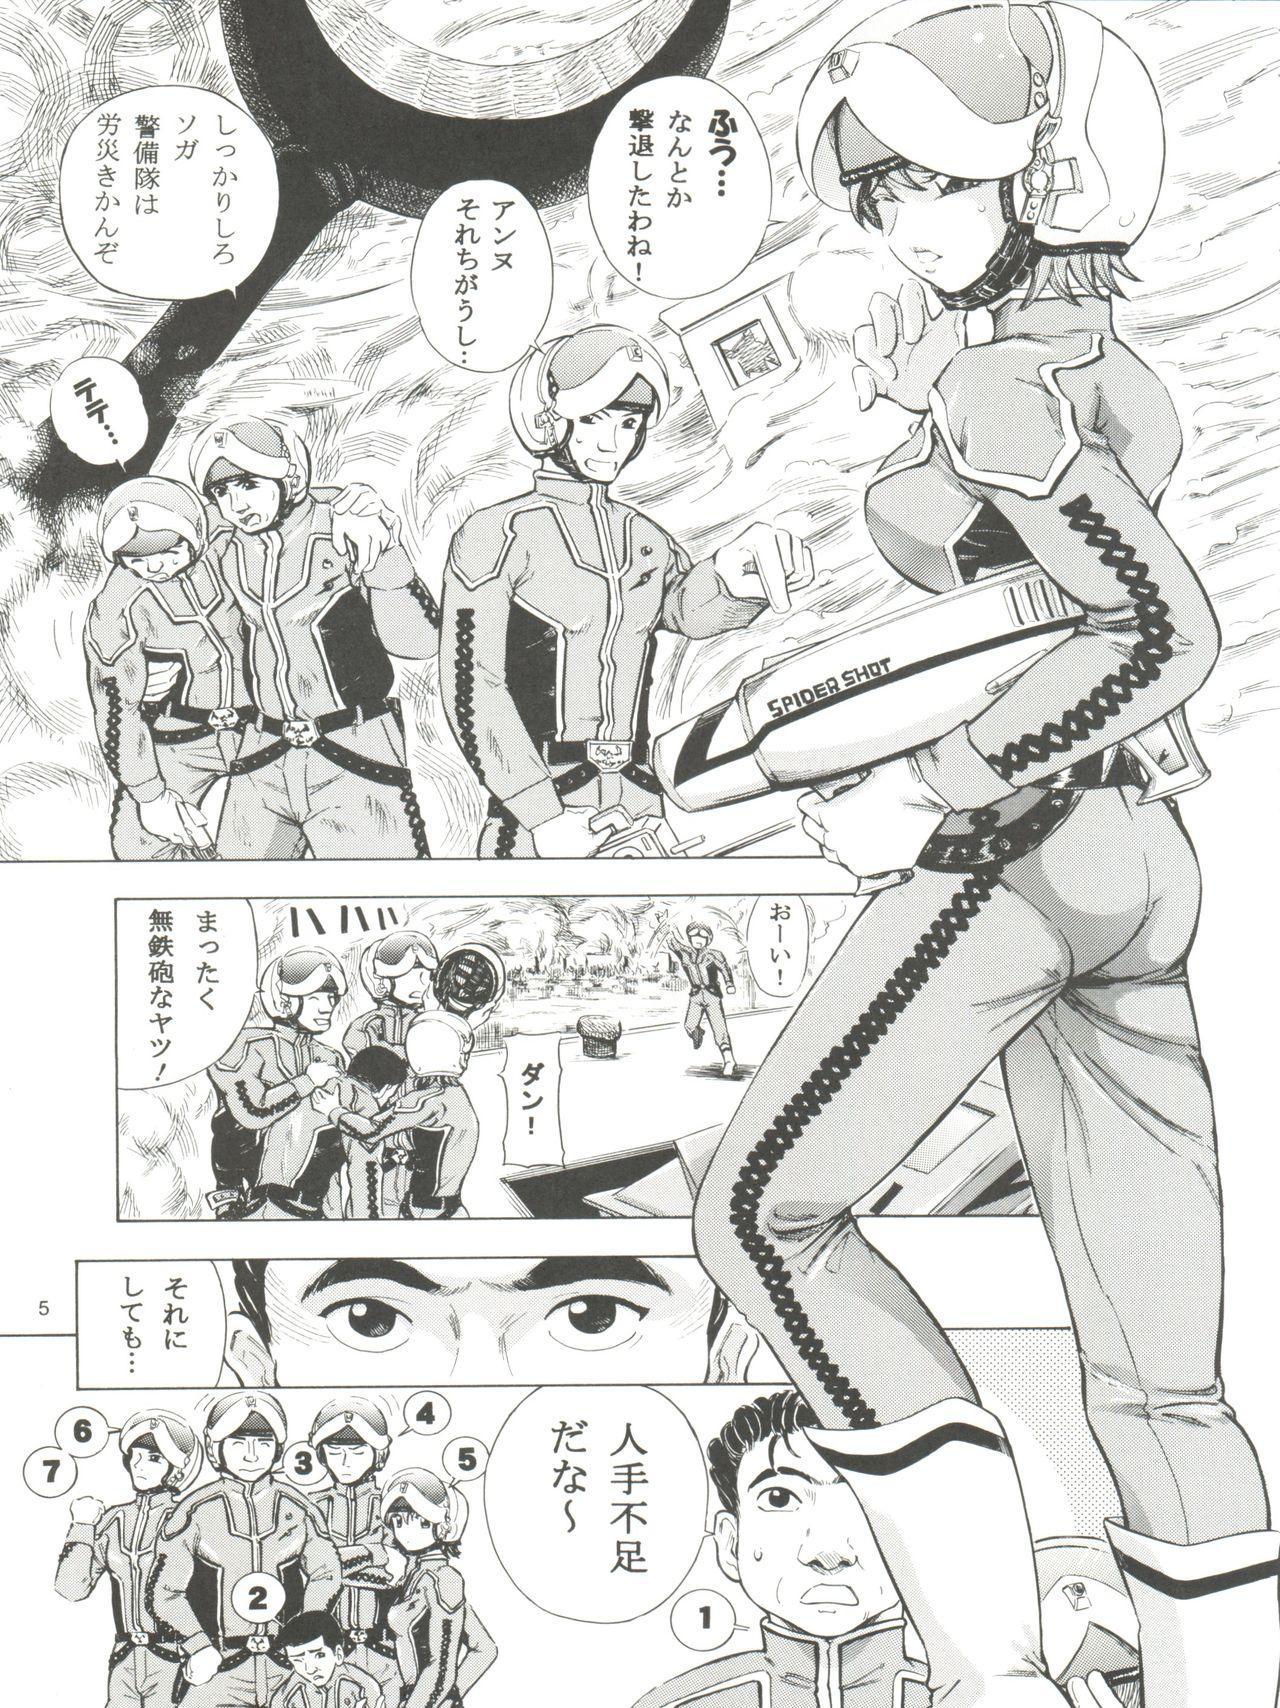 Mahou Kyuushiki 15 4